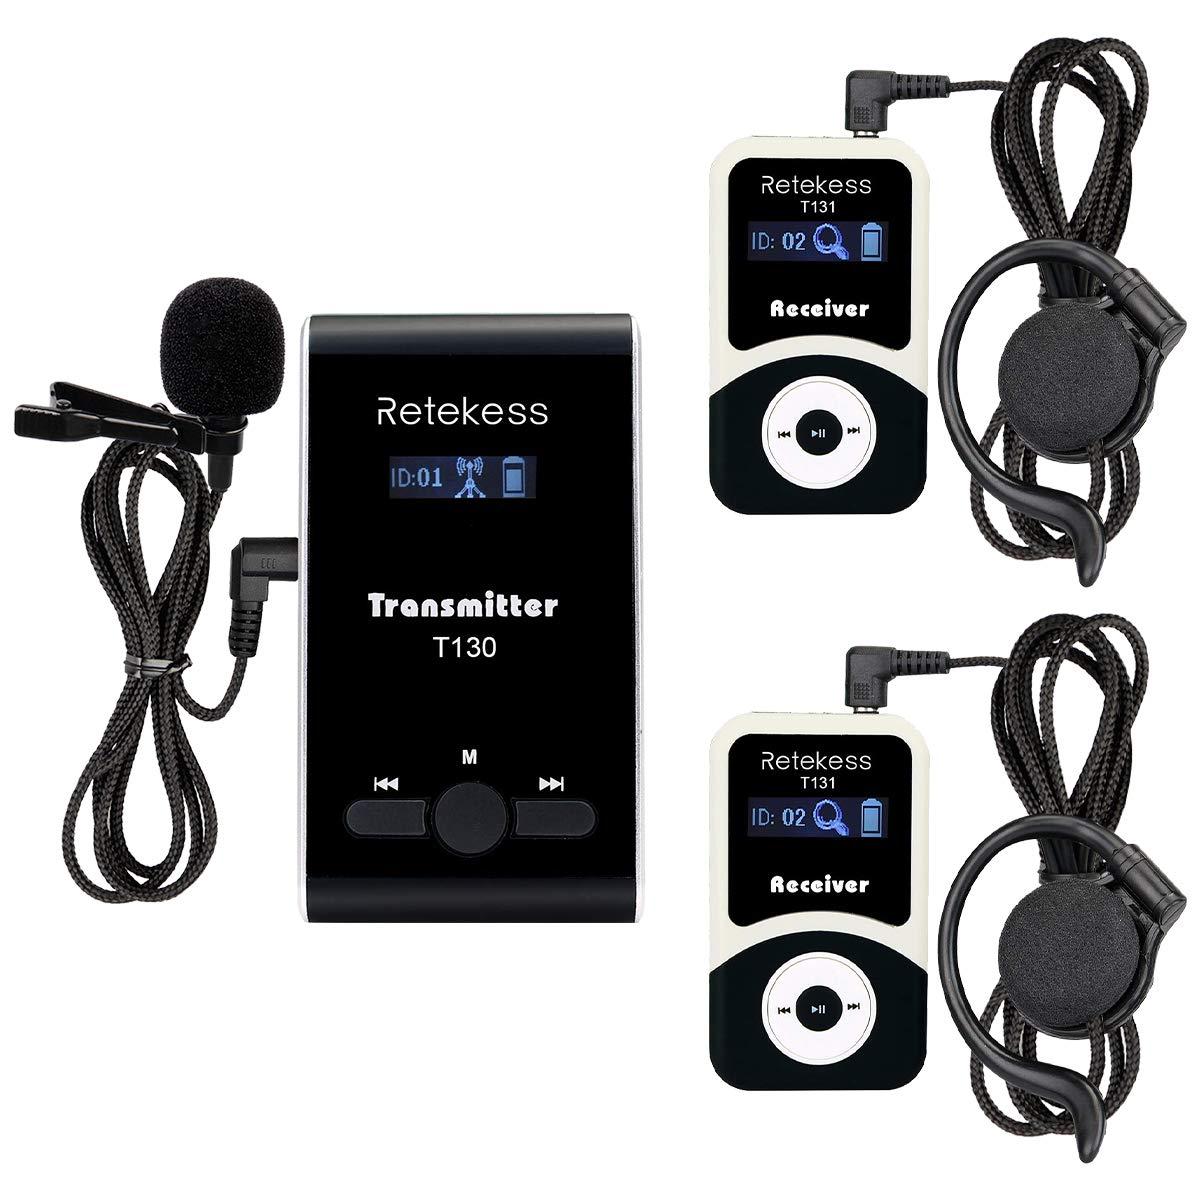 Retekess T130 99 Channel Wireless Tour Guide System Microphone Church Translation System for Interpretation Training Court(1 Transmitter 2 Receivers) by Retekess